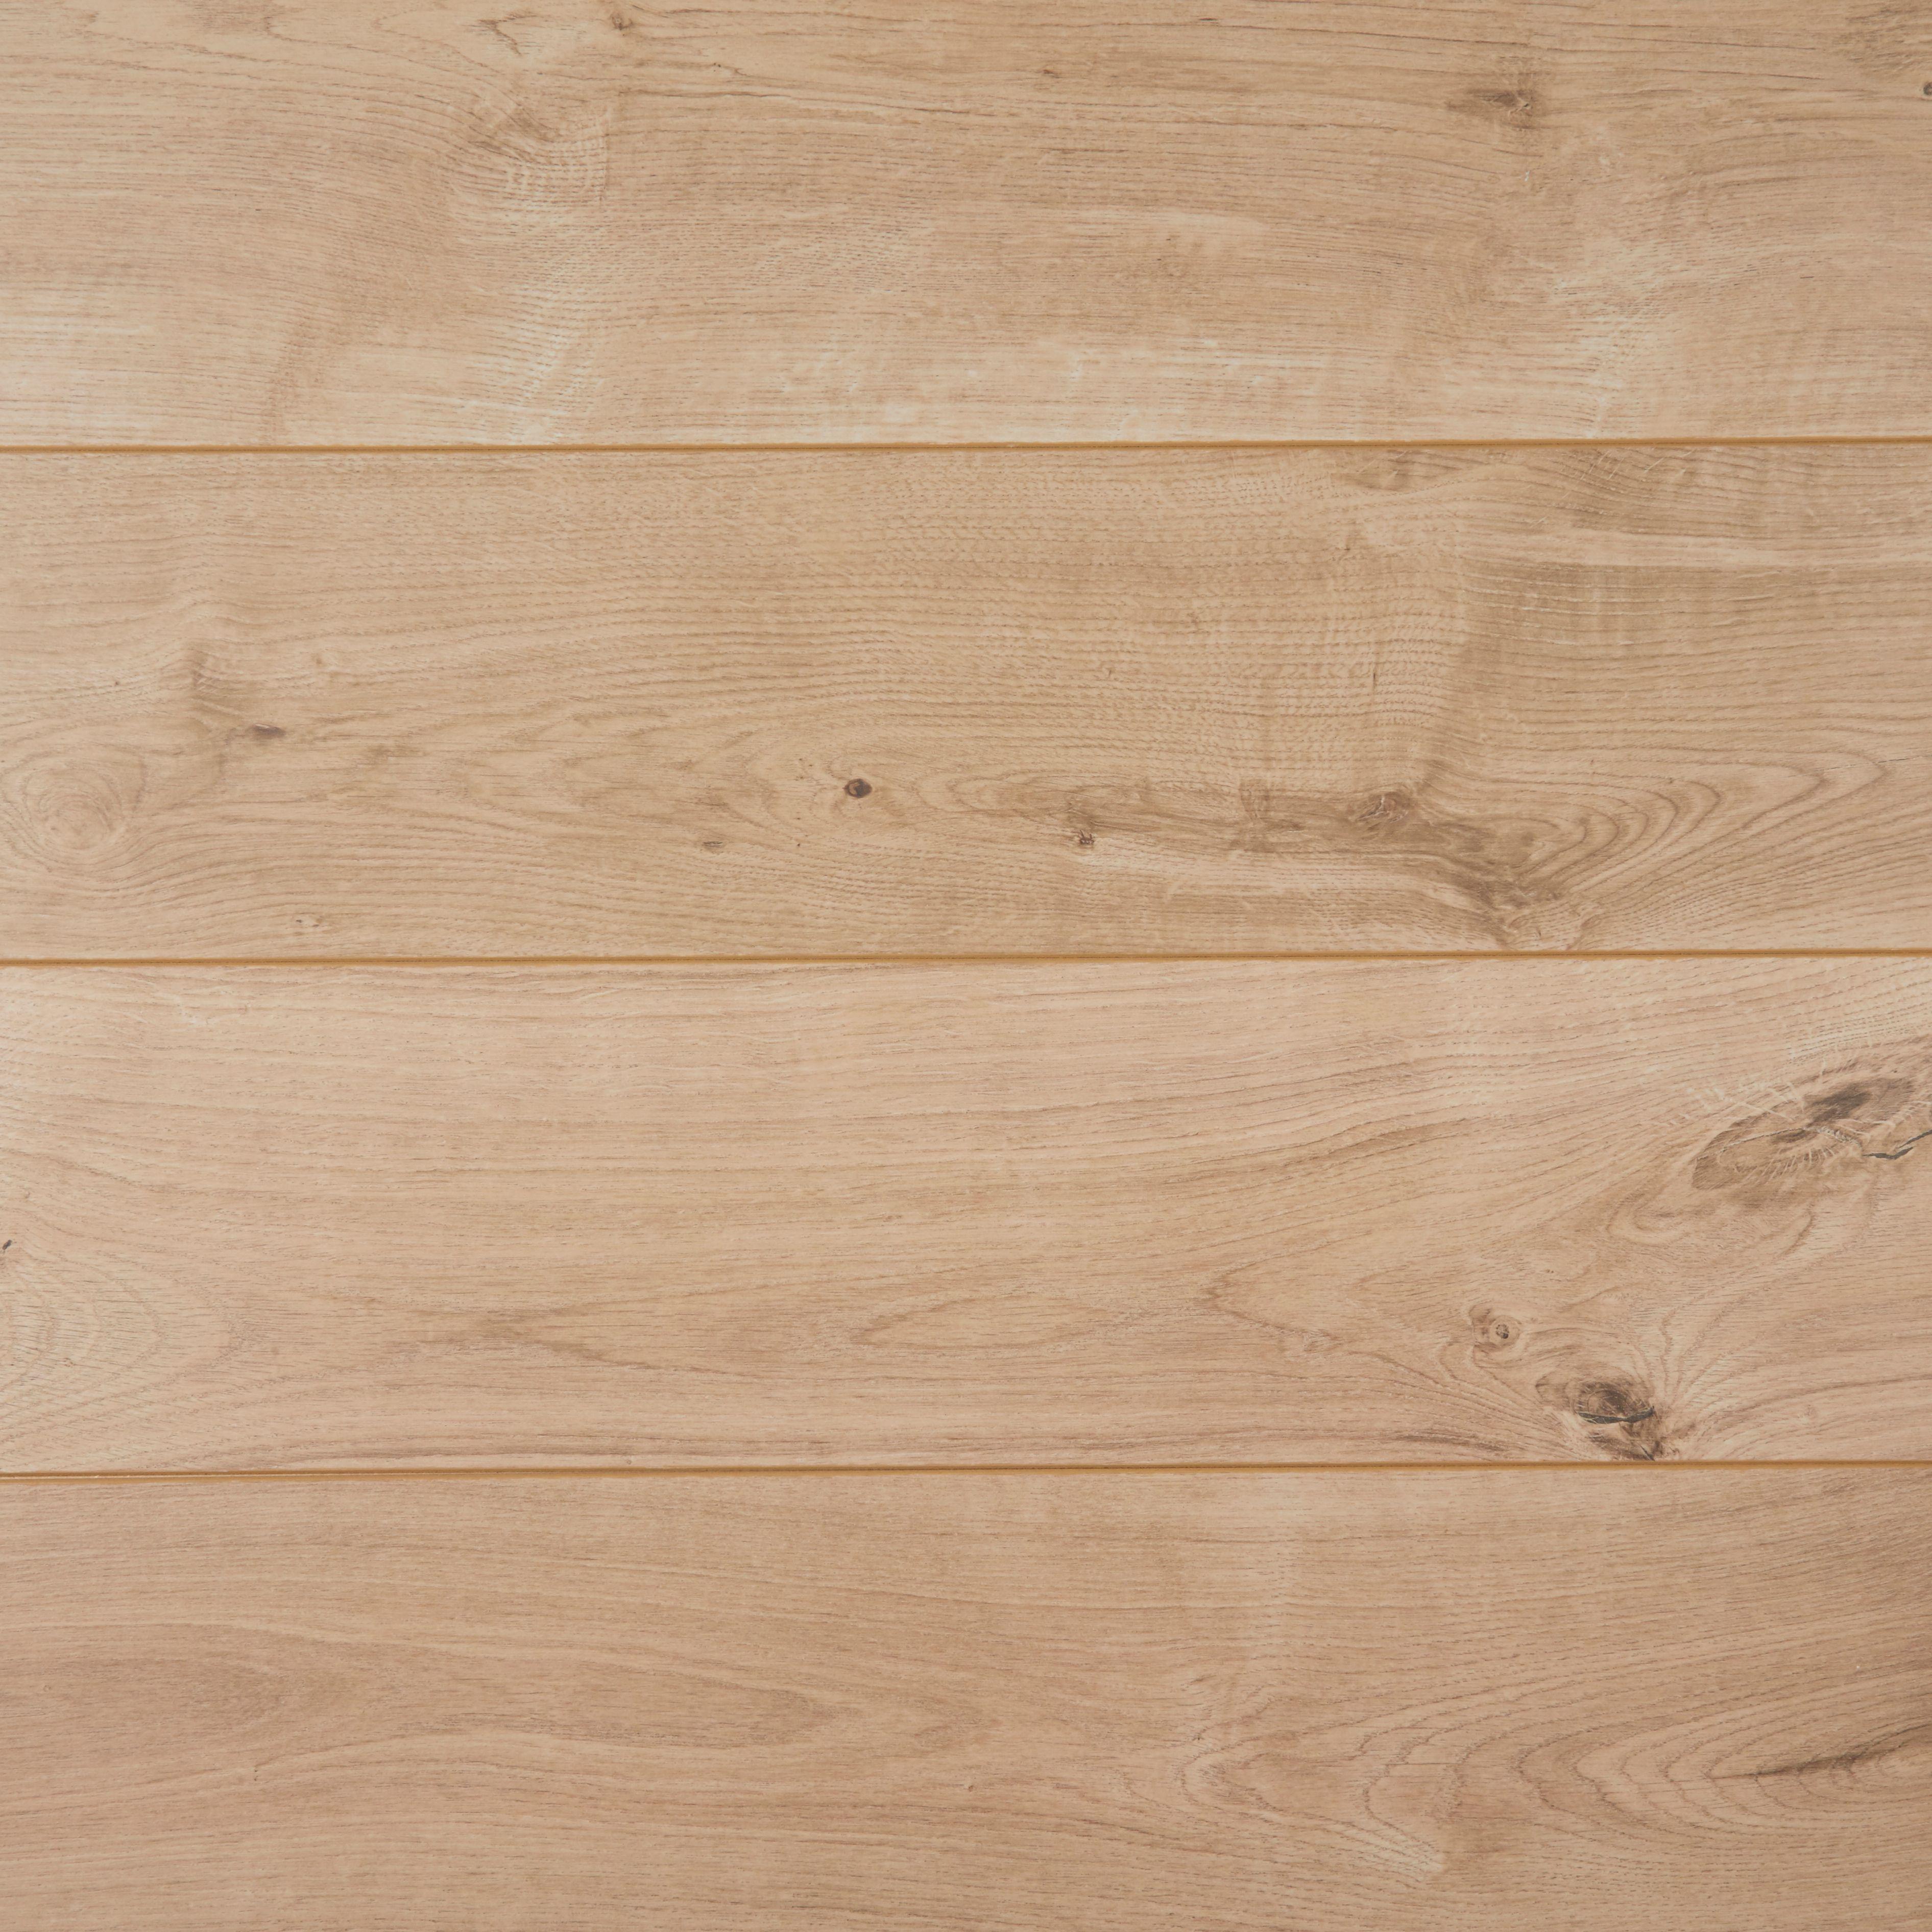 Gladstone Natural Laminate Flooring 8mm